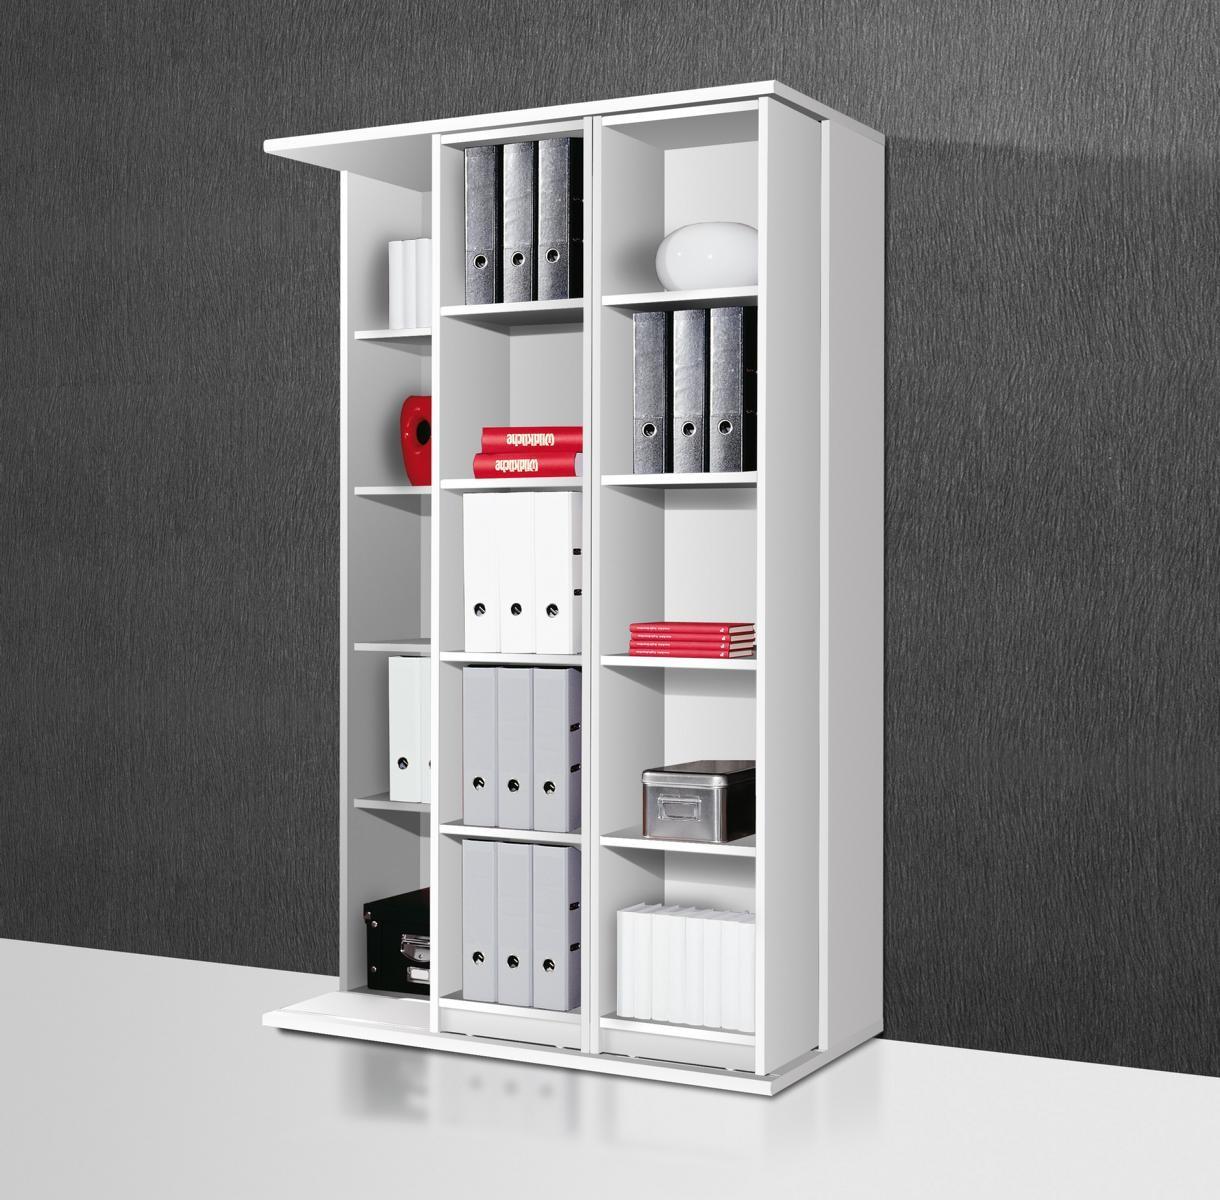 schieberegal aktenregal wei r543 h c m bel. Black Bedroom Furniture Sets. Home Design Ideas